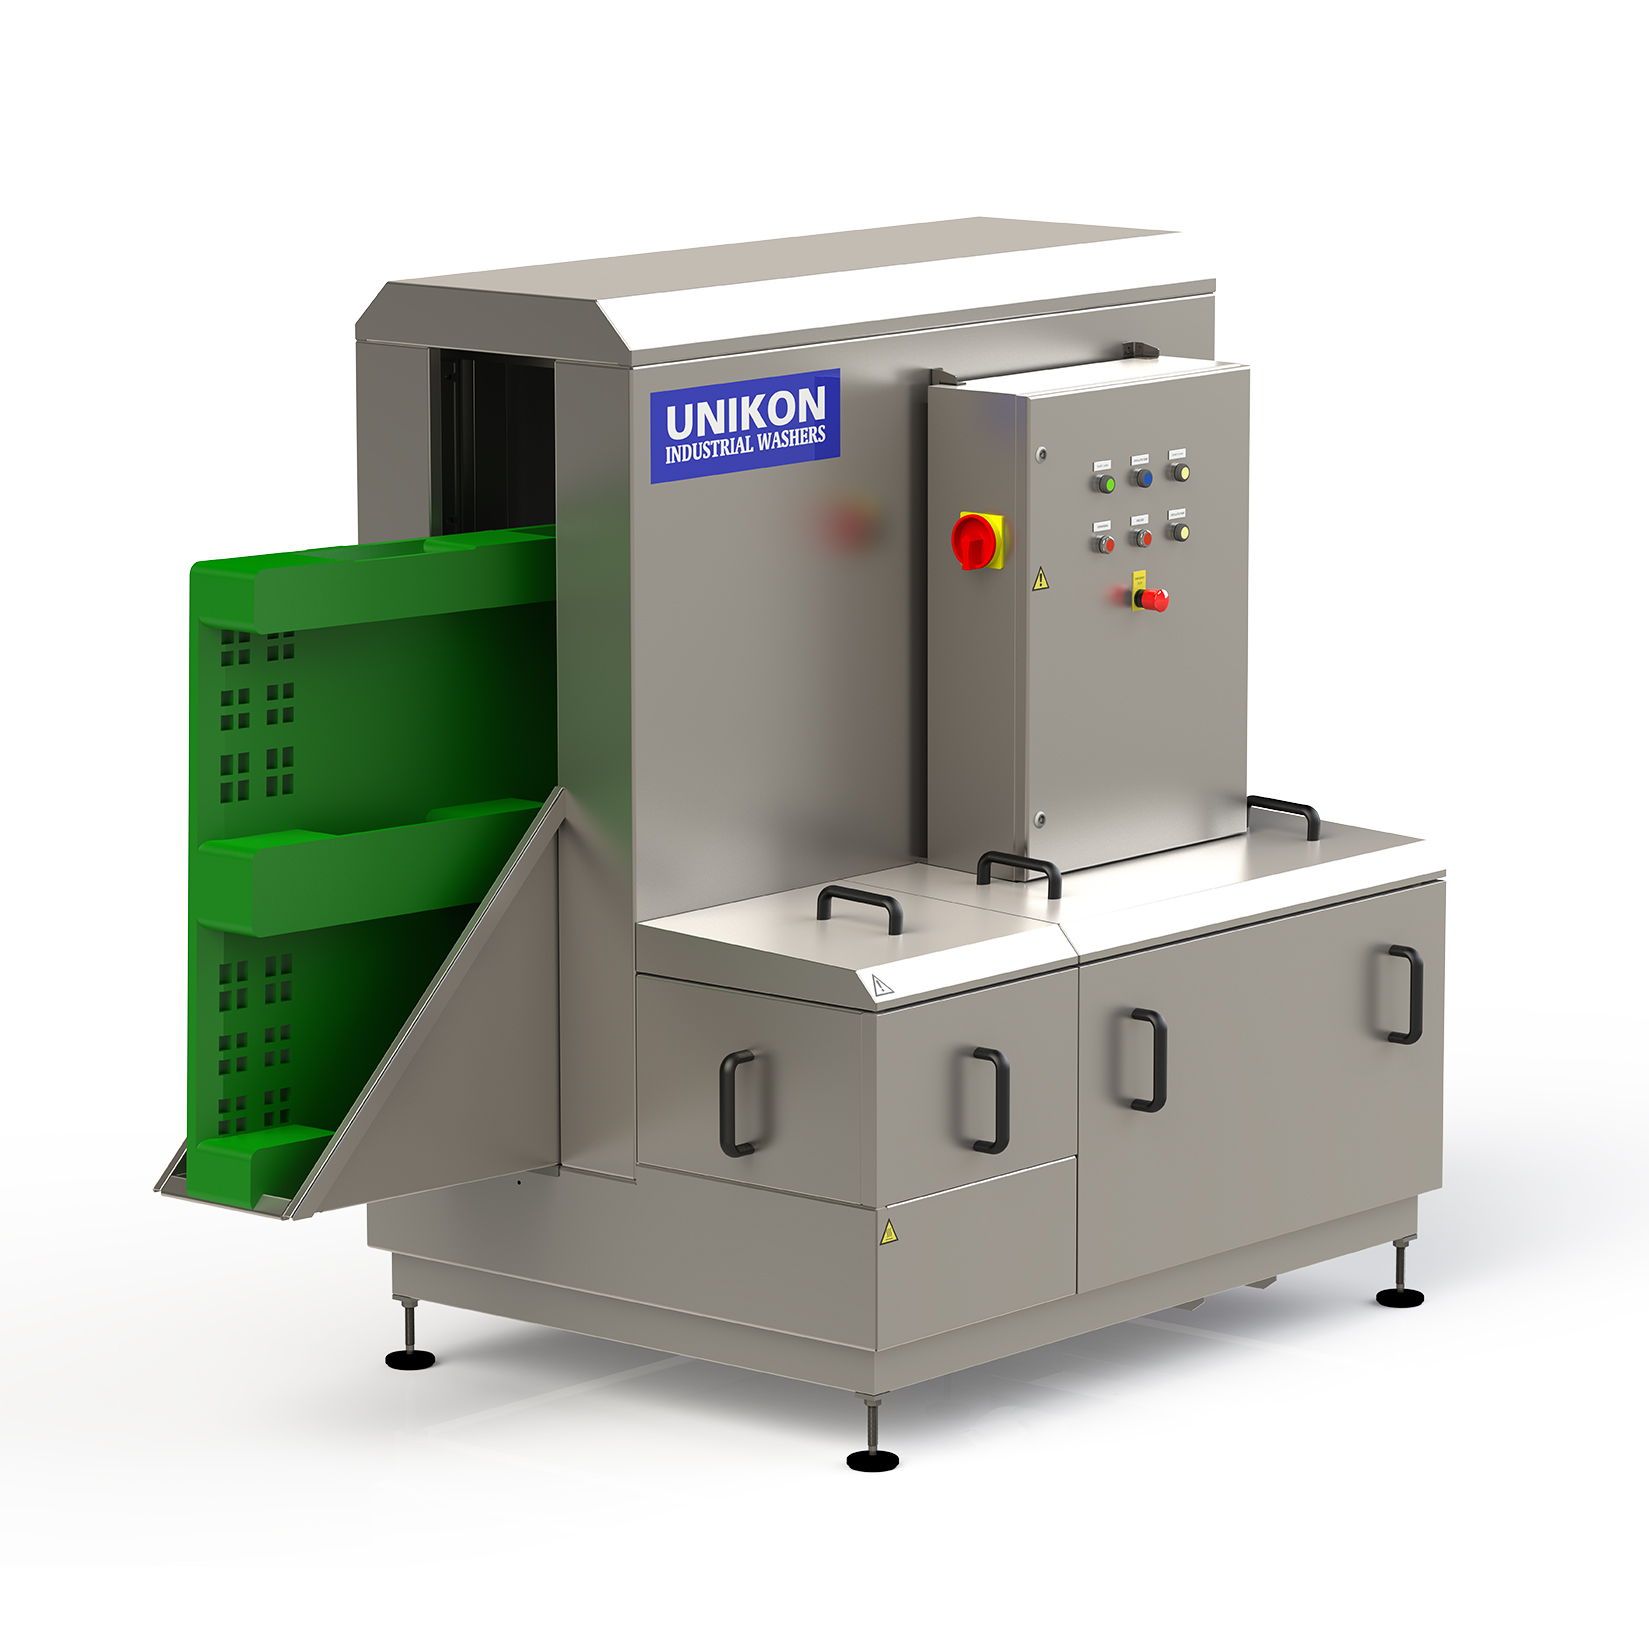 Pallet/divider washer – Unikon